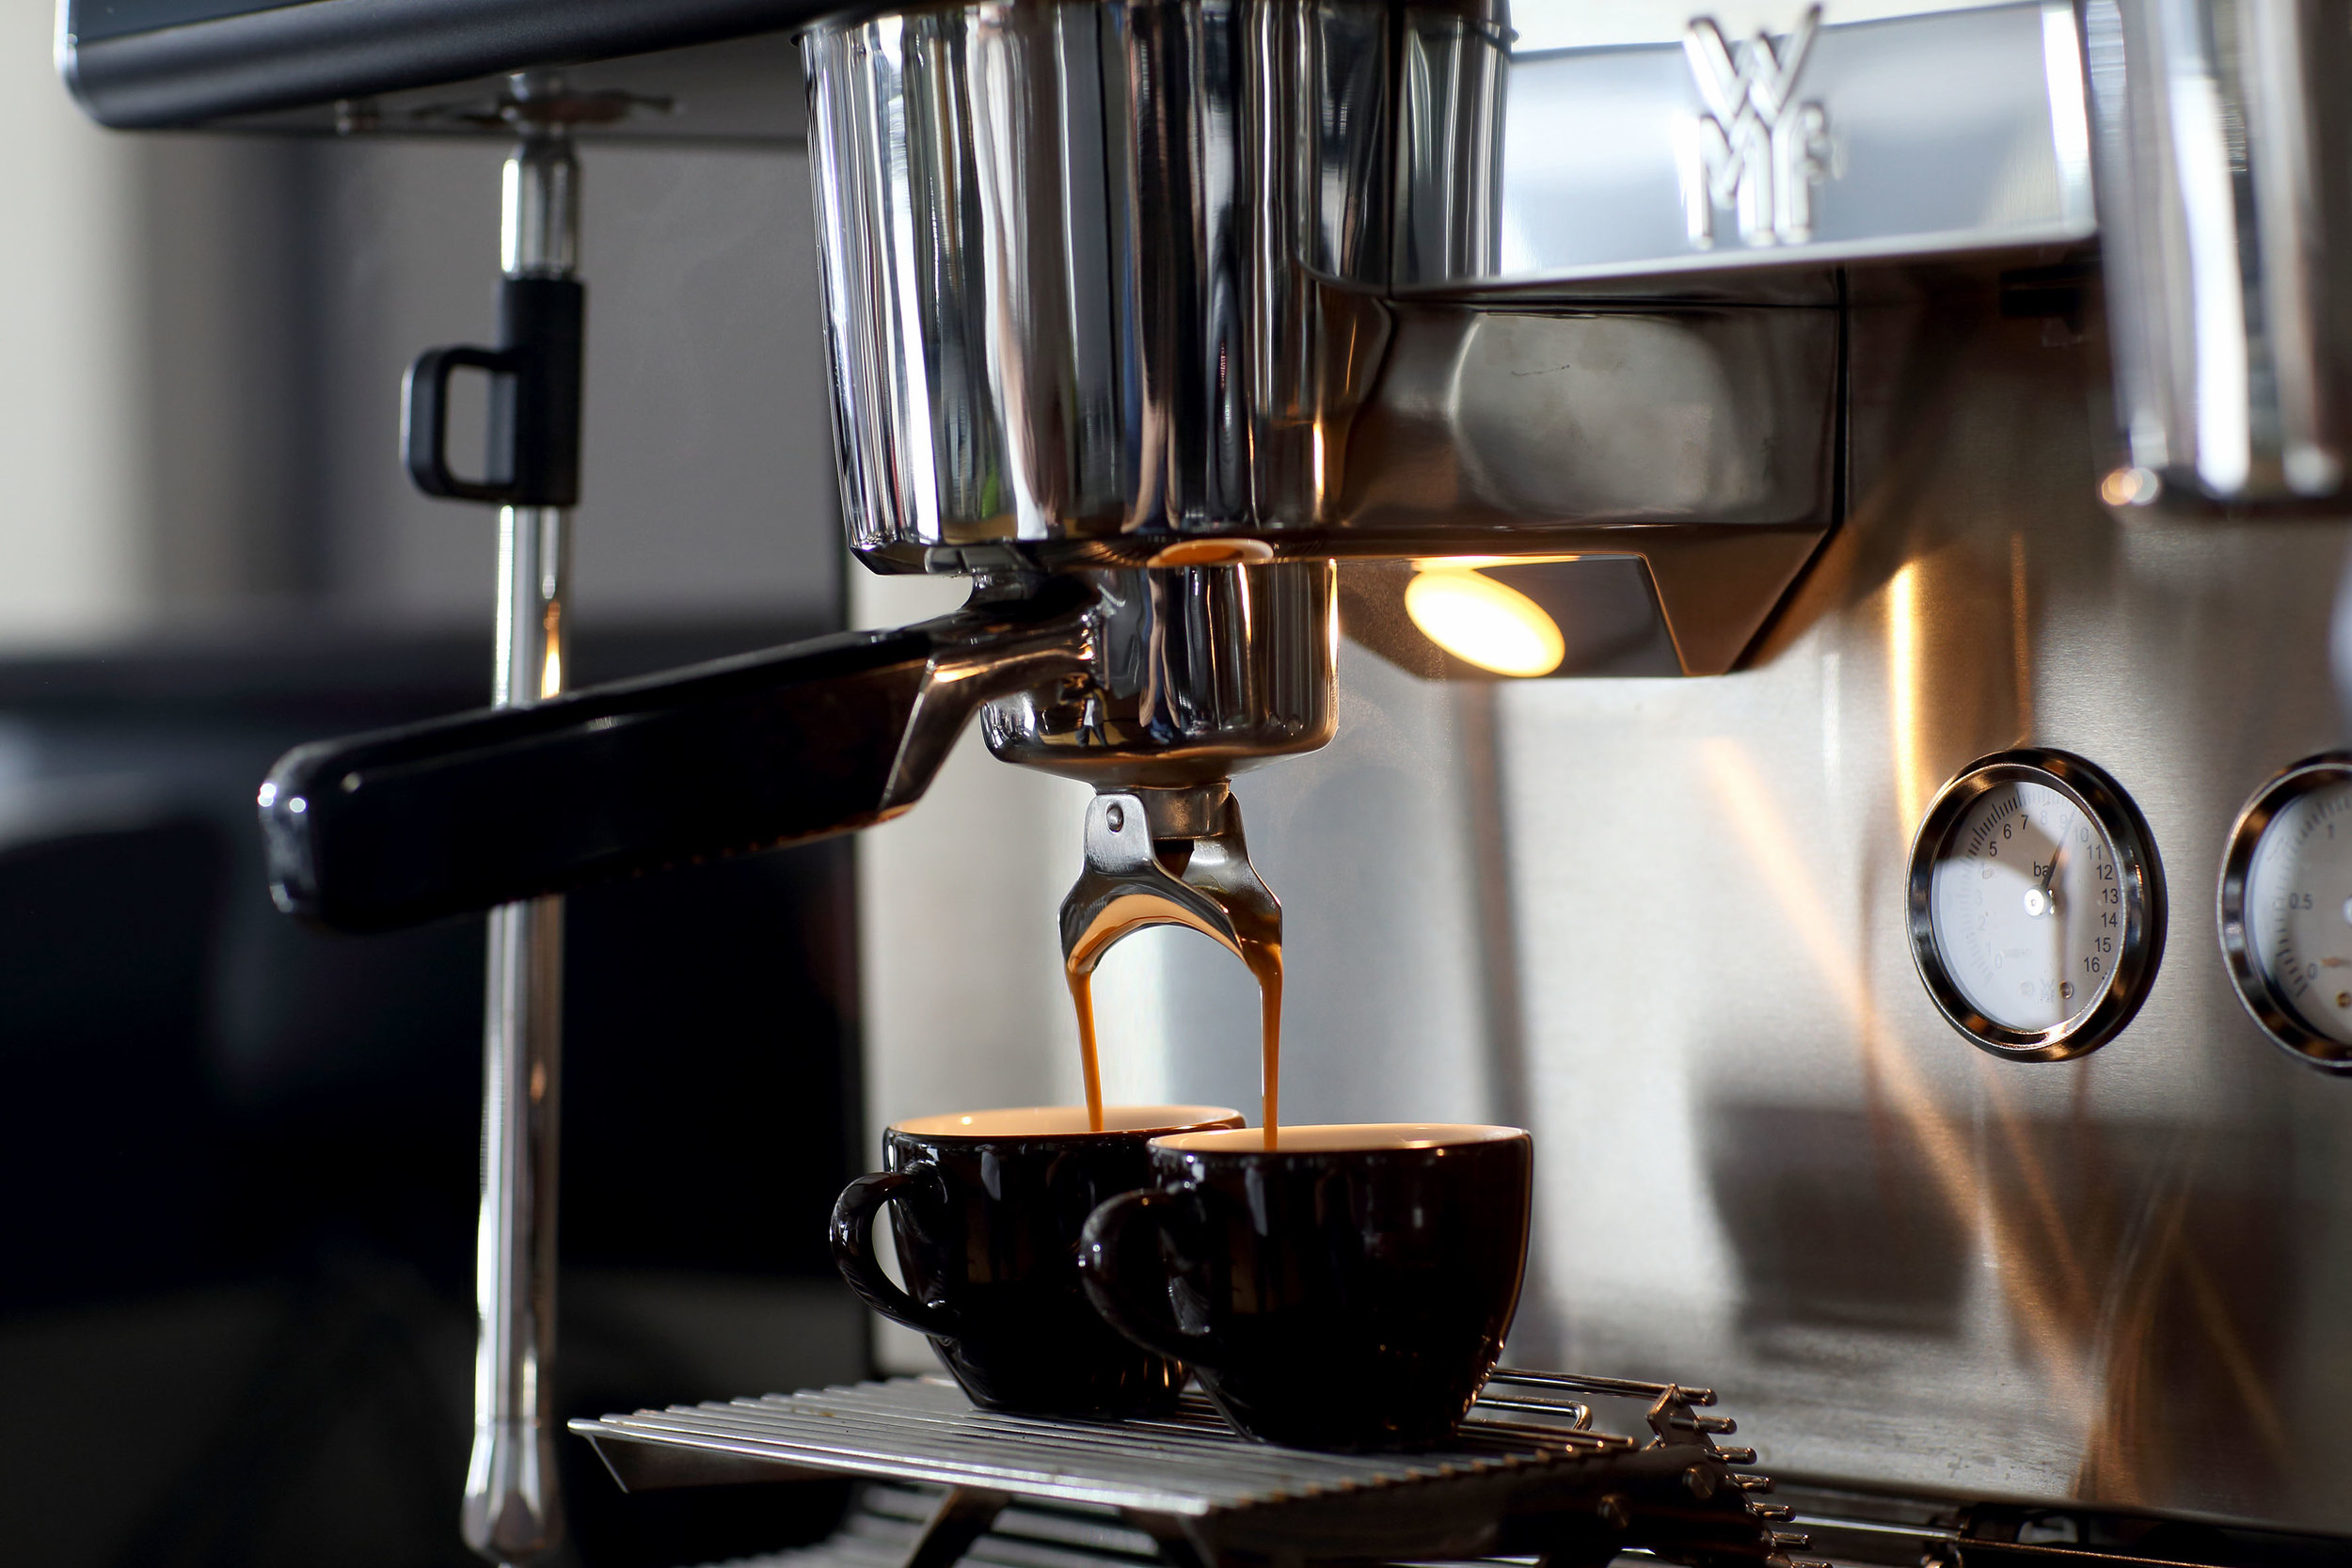 2015_WMF_espresso_Presse_02.jpg